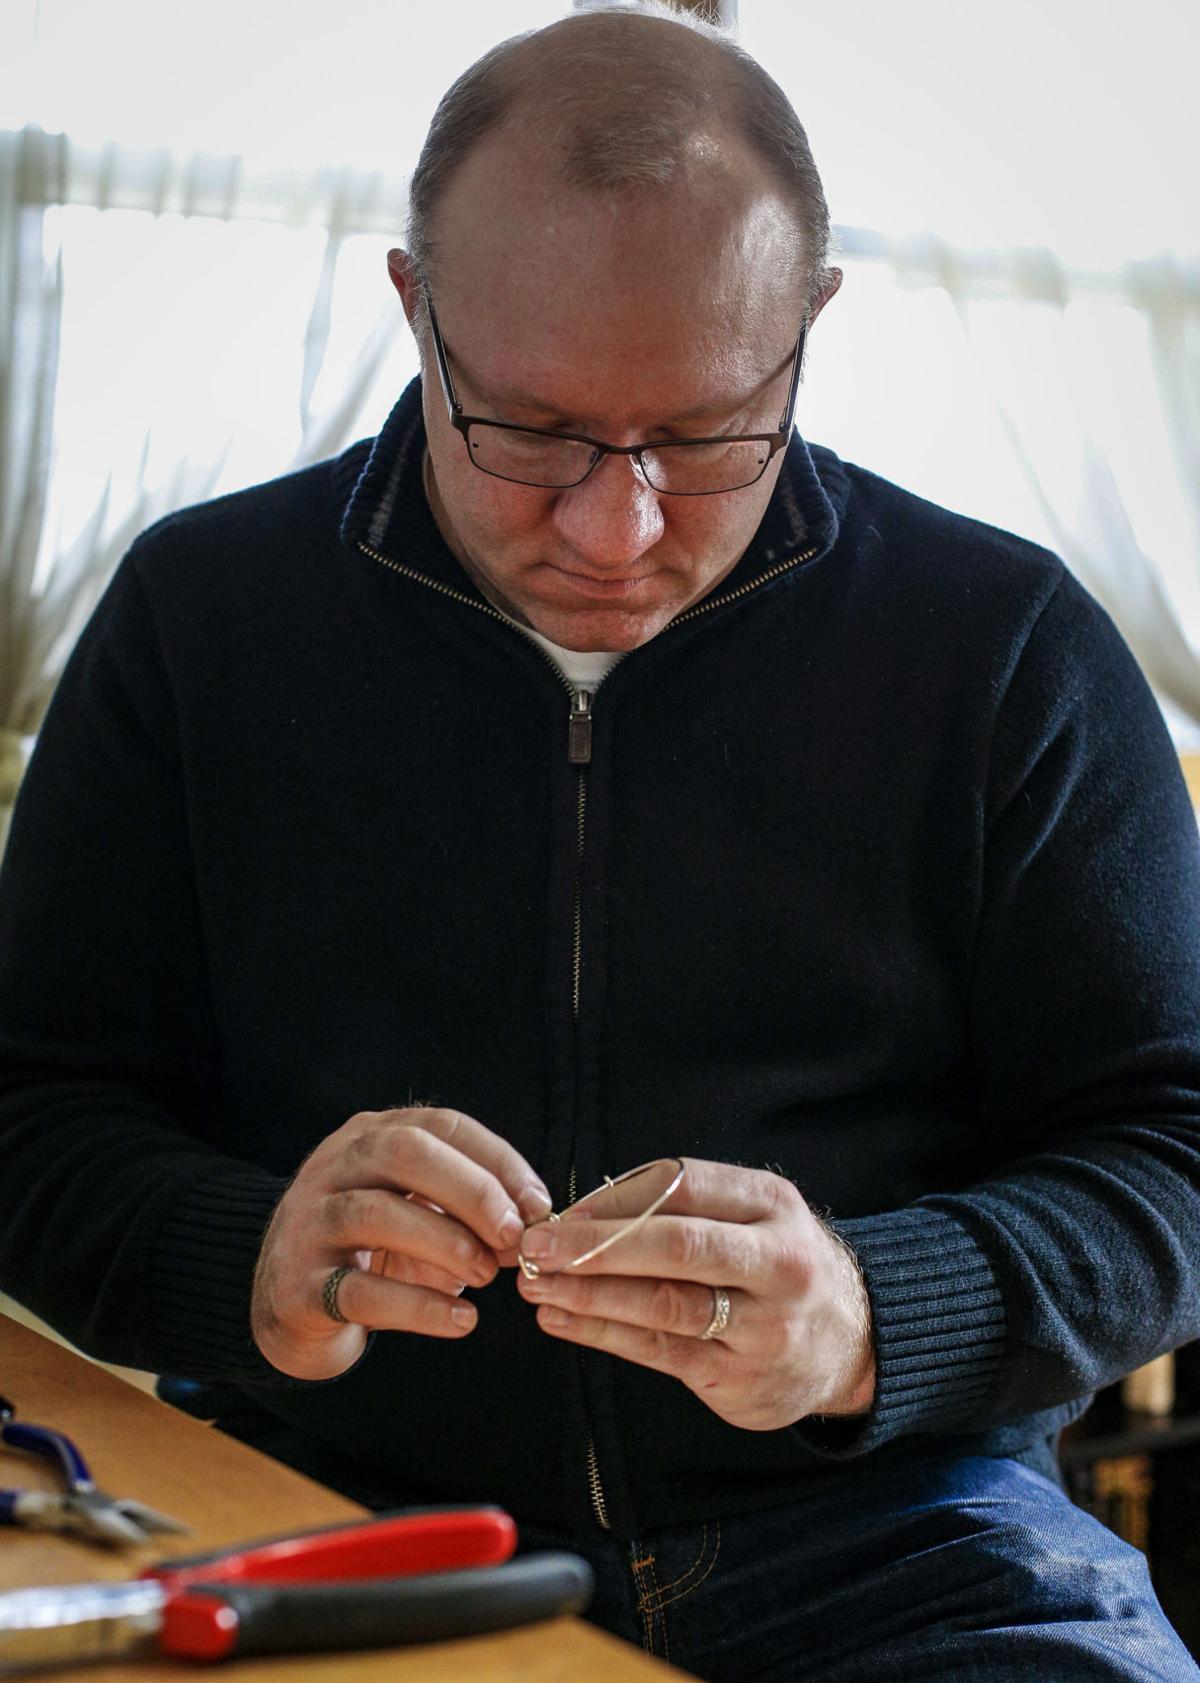 3D-printed jewelery